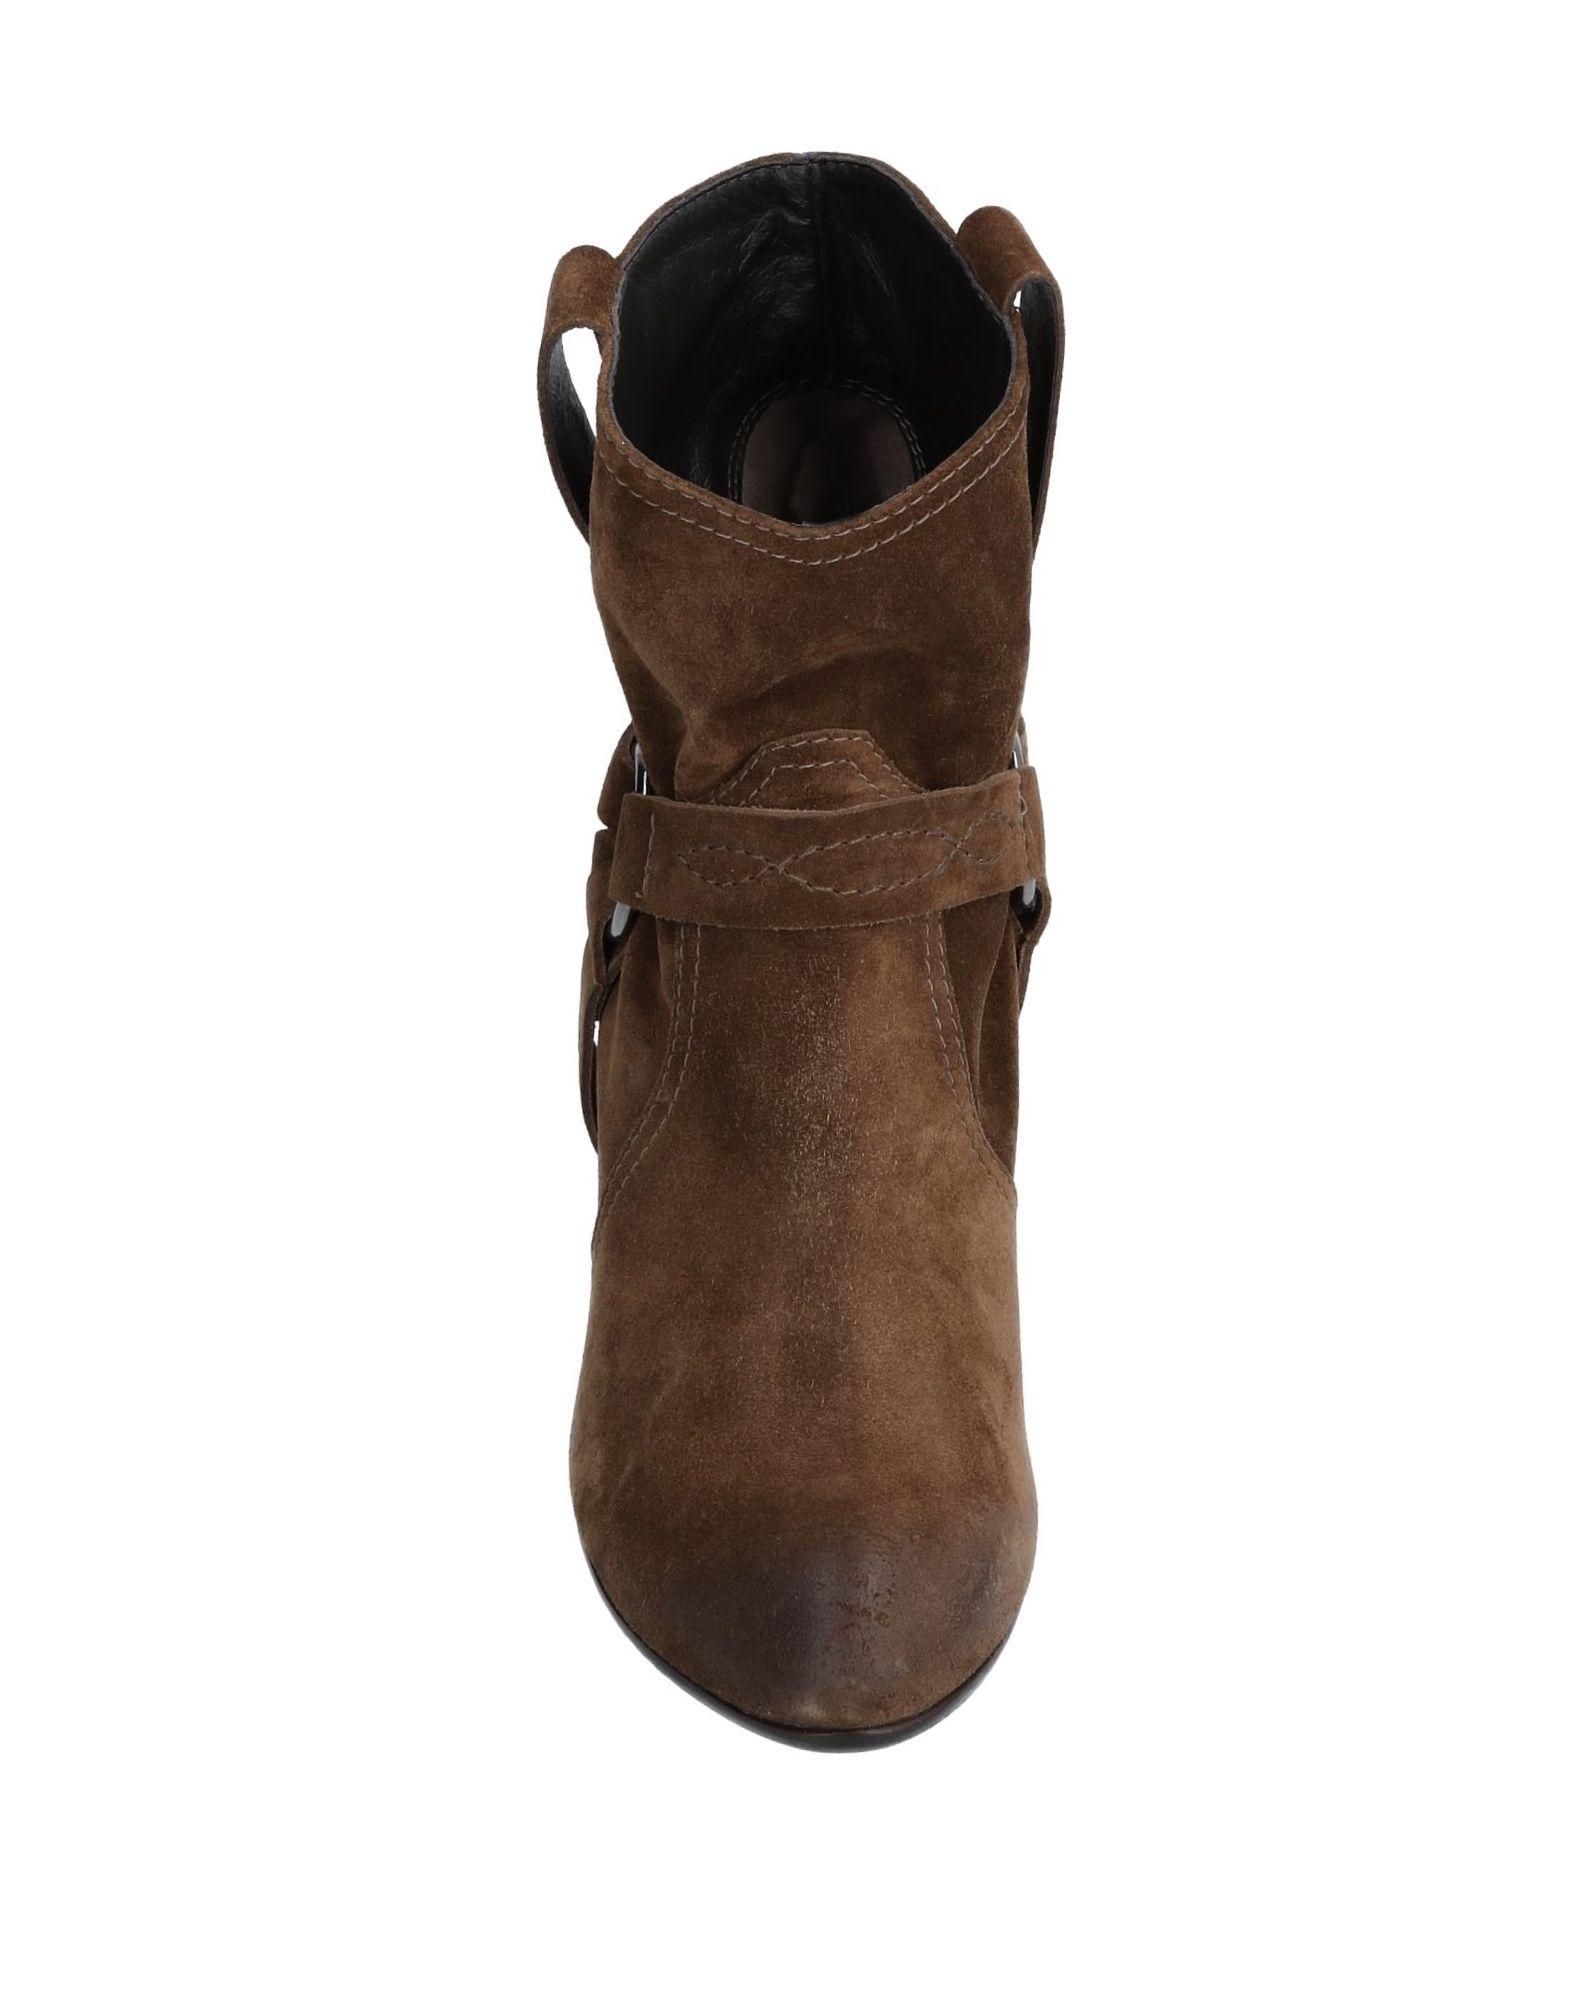 Stilvolle billige Schuhe Via Roma 11238499XG 15 Stiefelette Damen  11238499XG Roma 4c2539